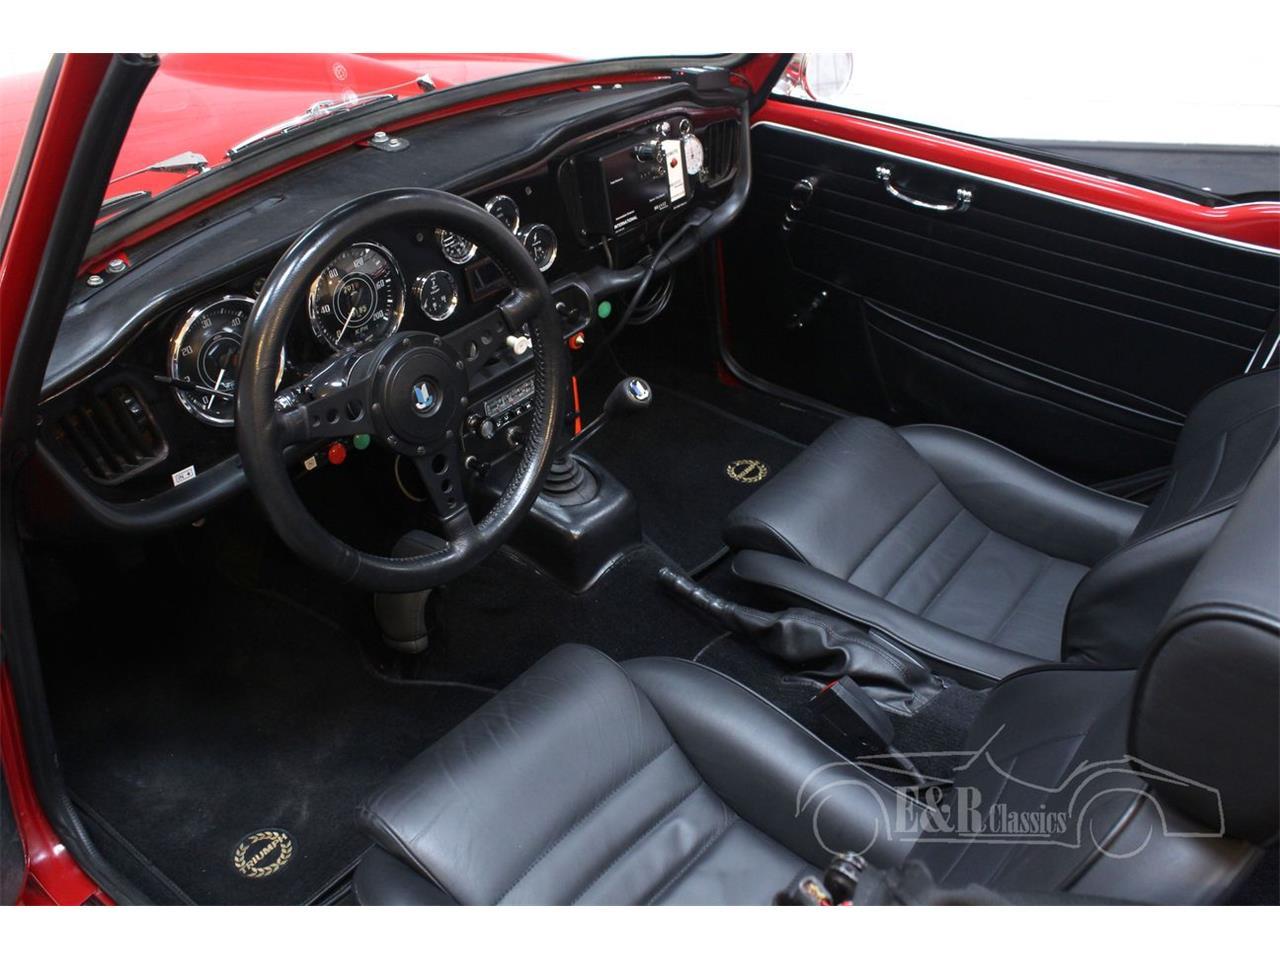 1966 Triumph TR4 (CC-1303101) for sale in Waalwijk, Noord-Brabant